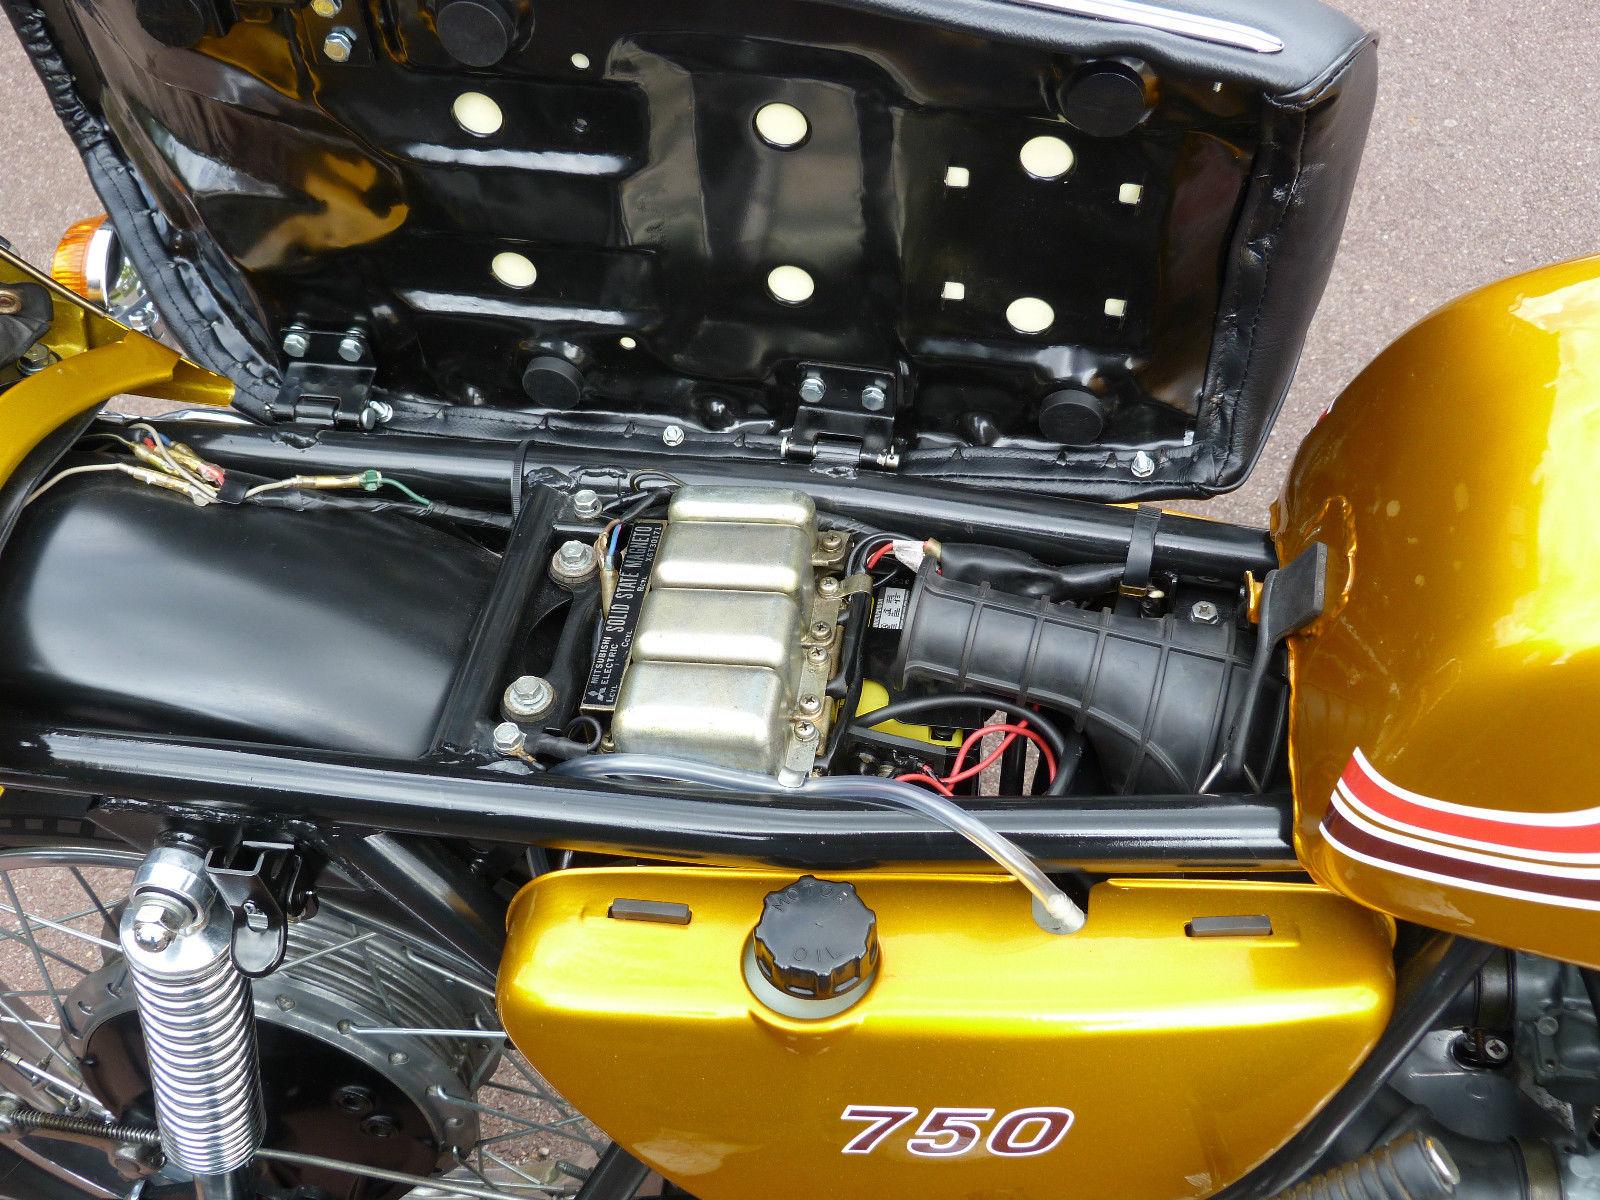 Kawasaki H2 750 - 1972 - Oil Tank, Air Intake, Wiring and Seat Base.